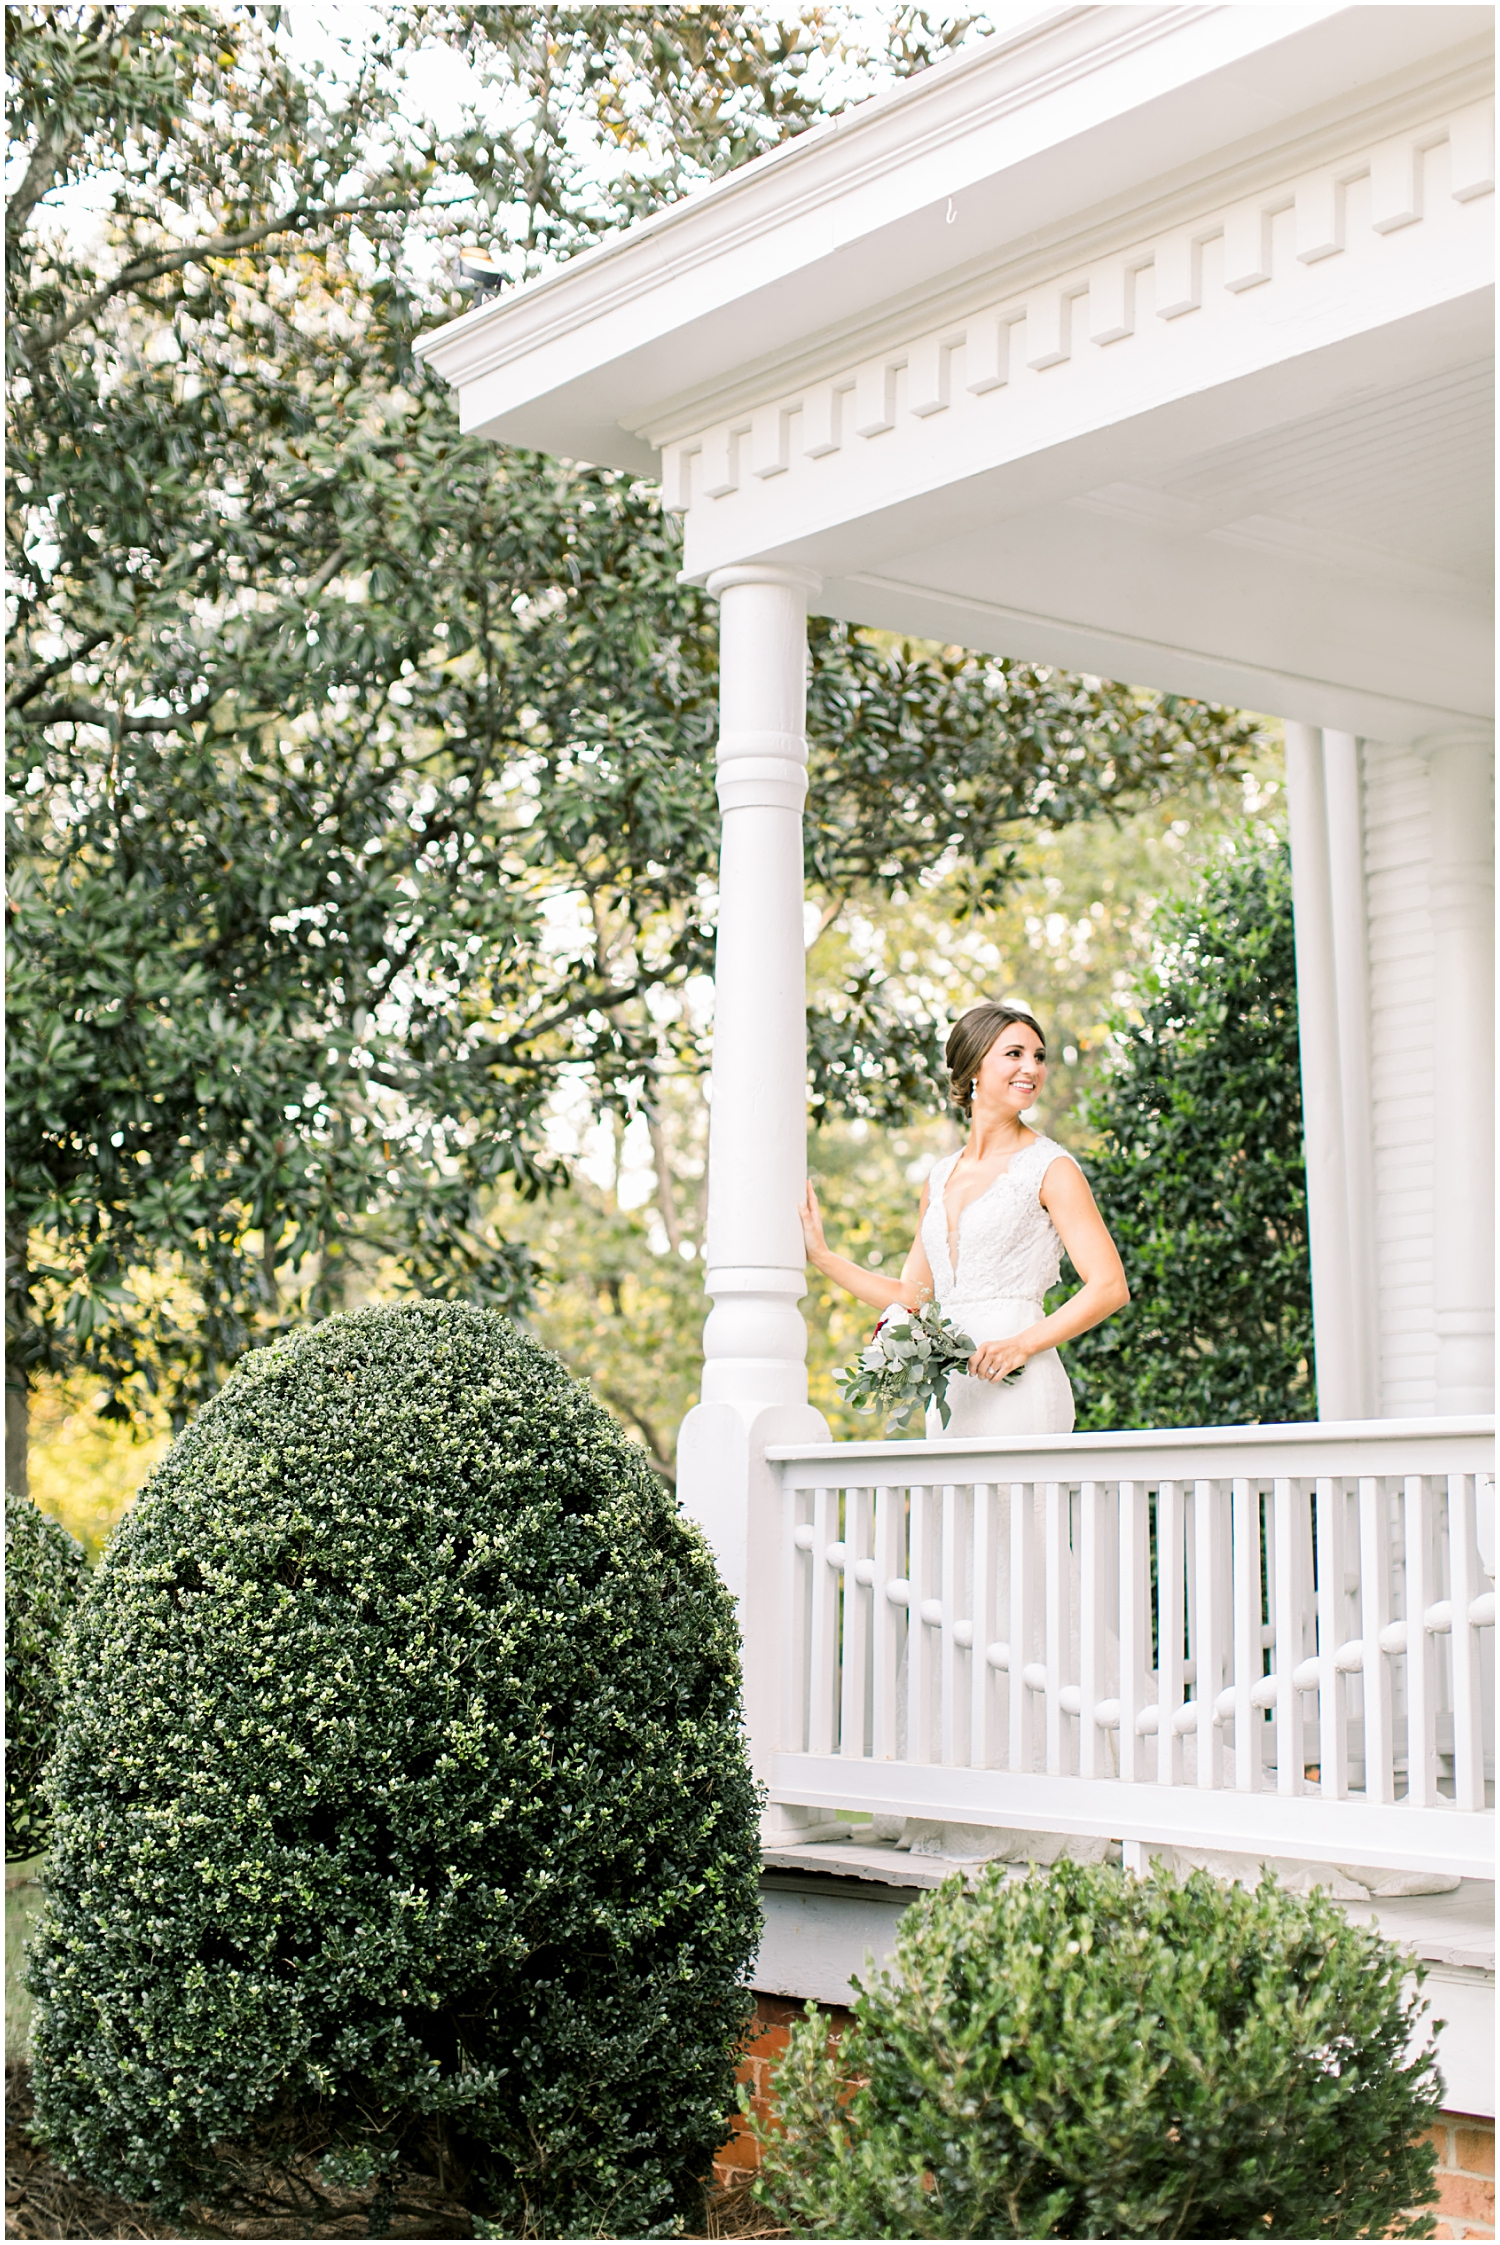 Victorian Crow's Nest  Bridal Session, Charlotte NC Wedding_Erin L. Taylor Photography_0002.jpg